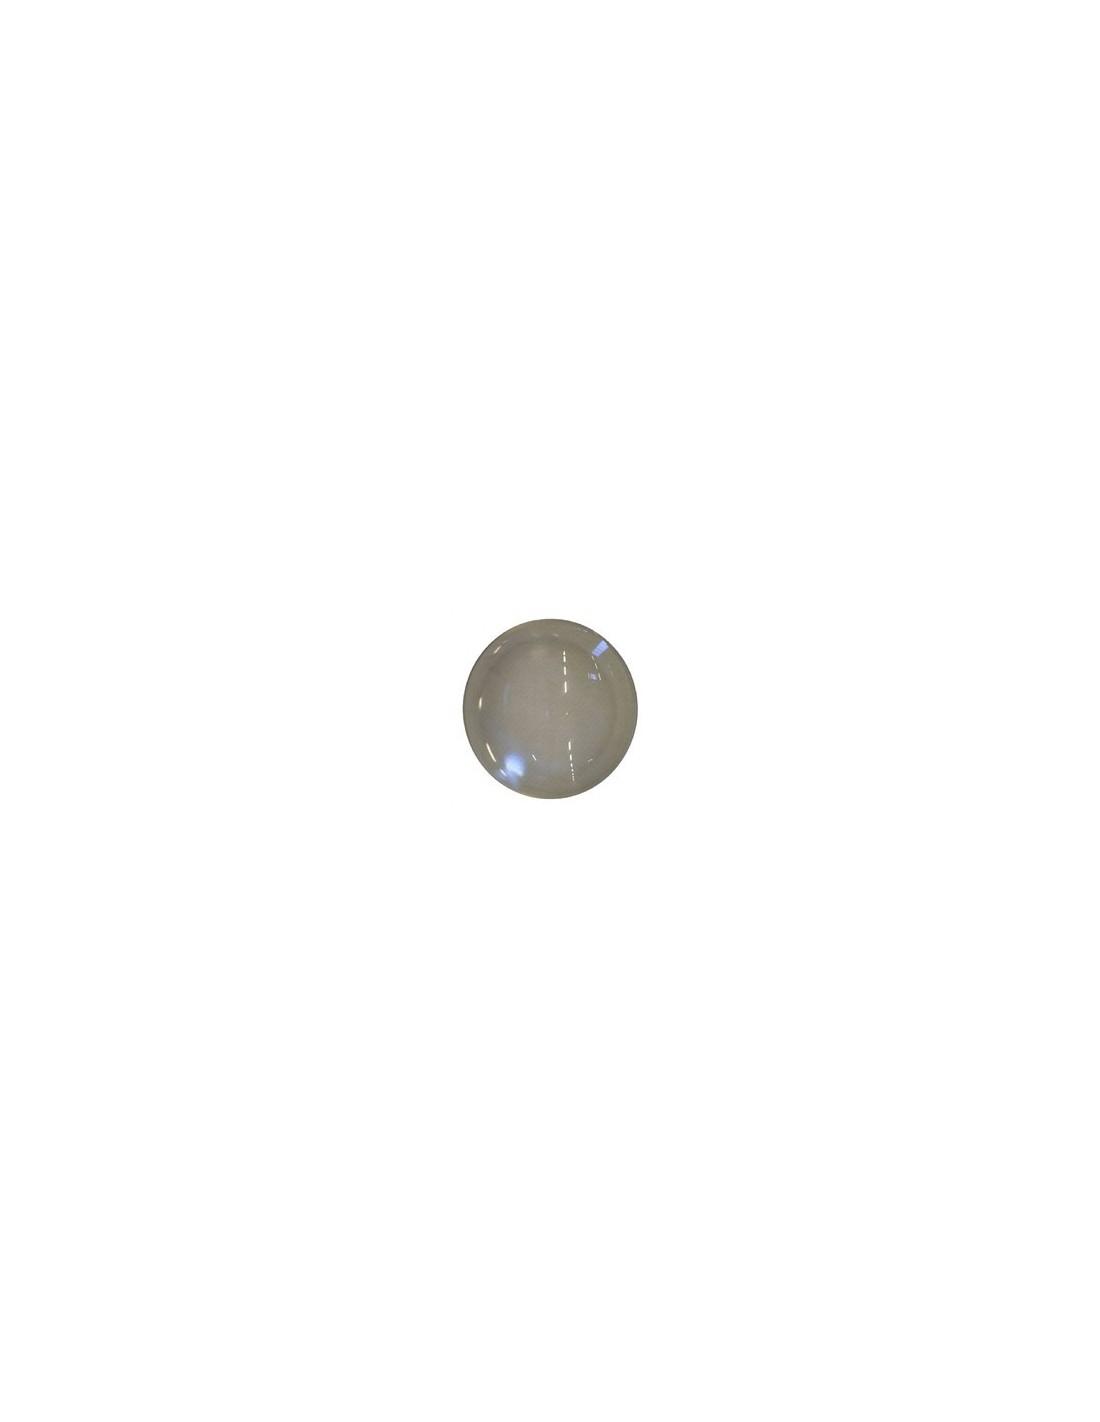 UPP00096 - Frogeyelins/emblem blank 60mm